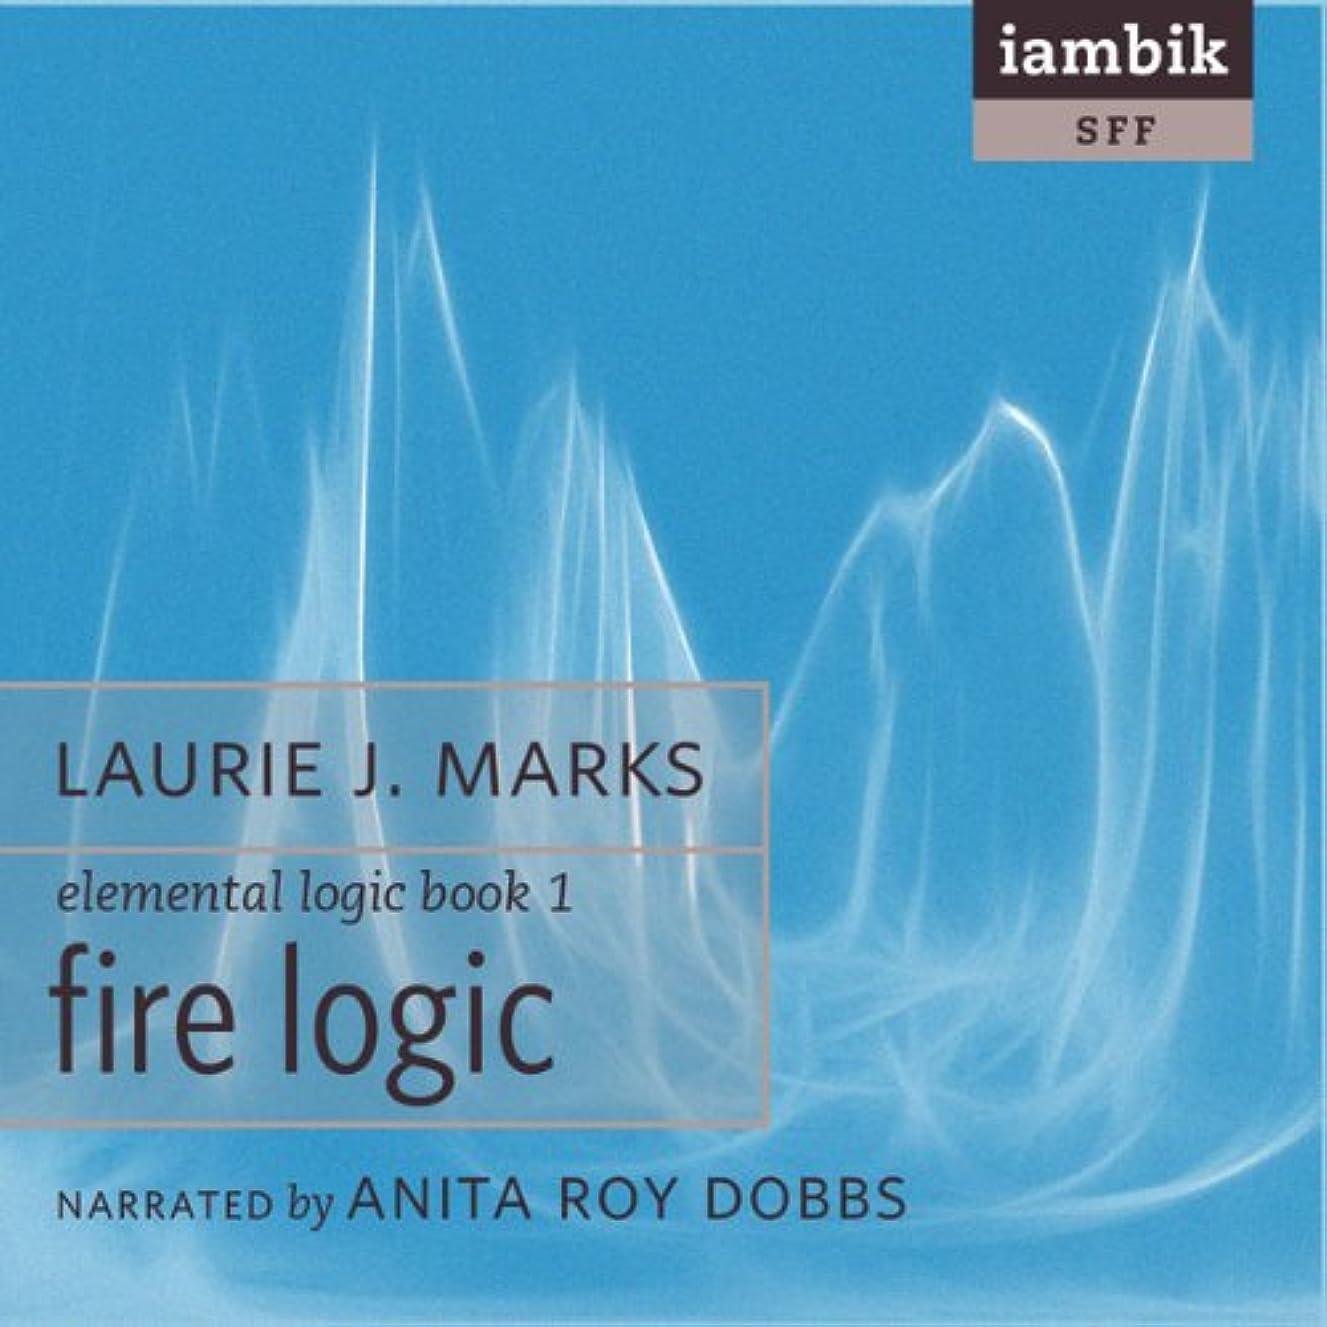 Fire Logic: Book 1 of Elemental Logic